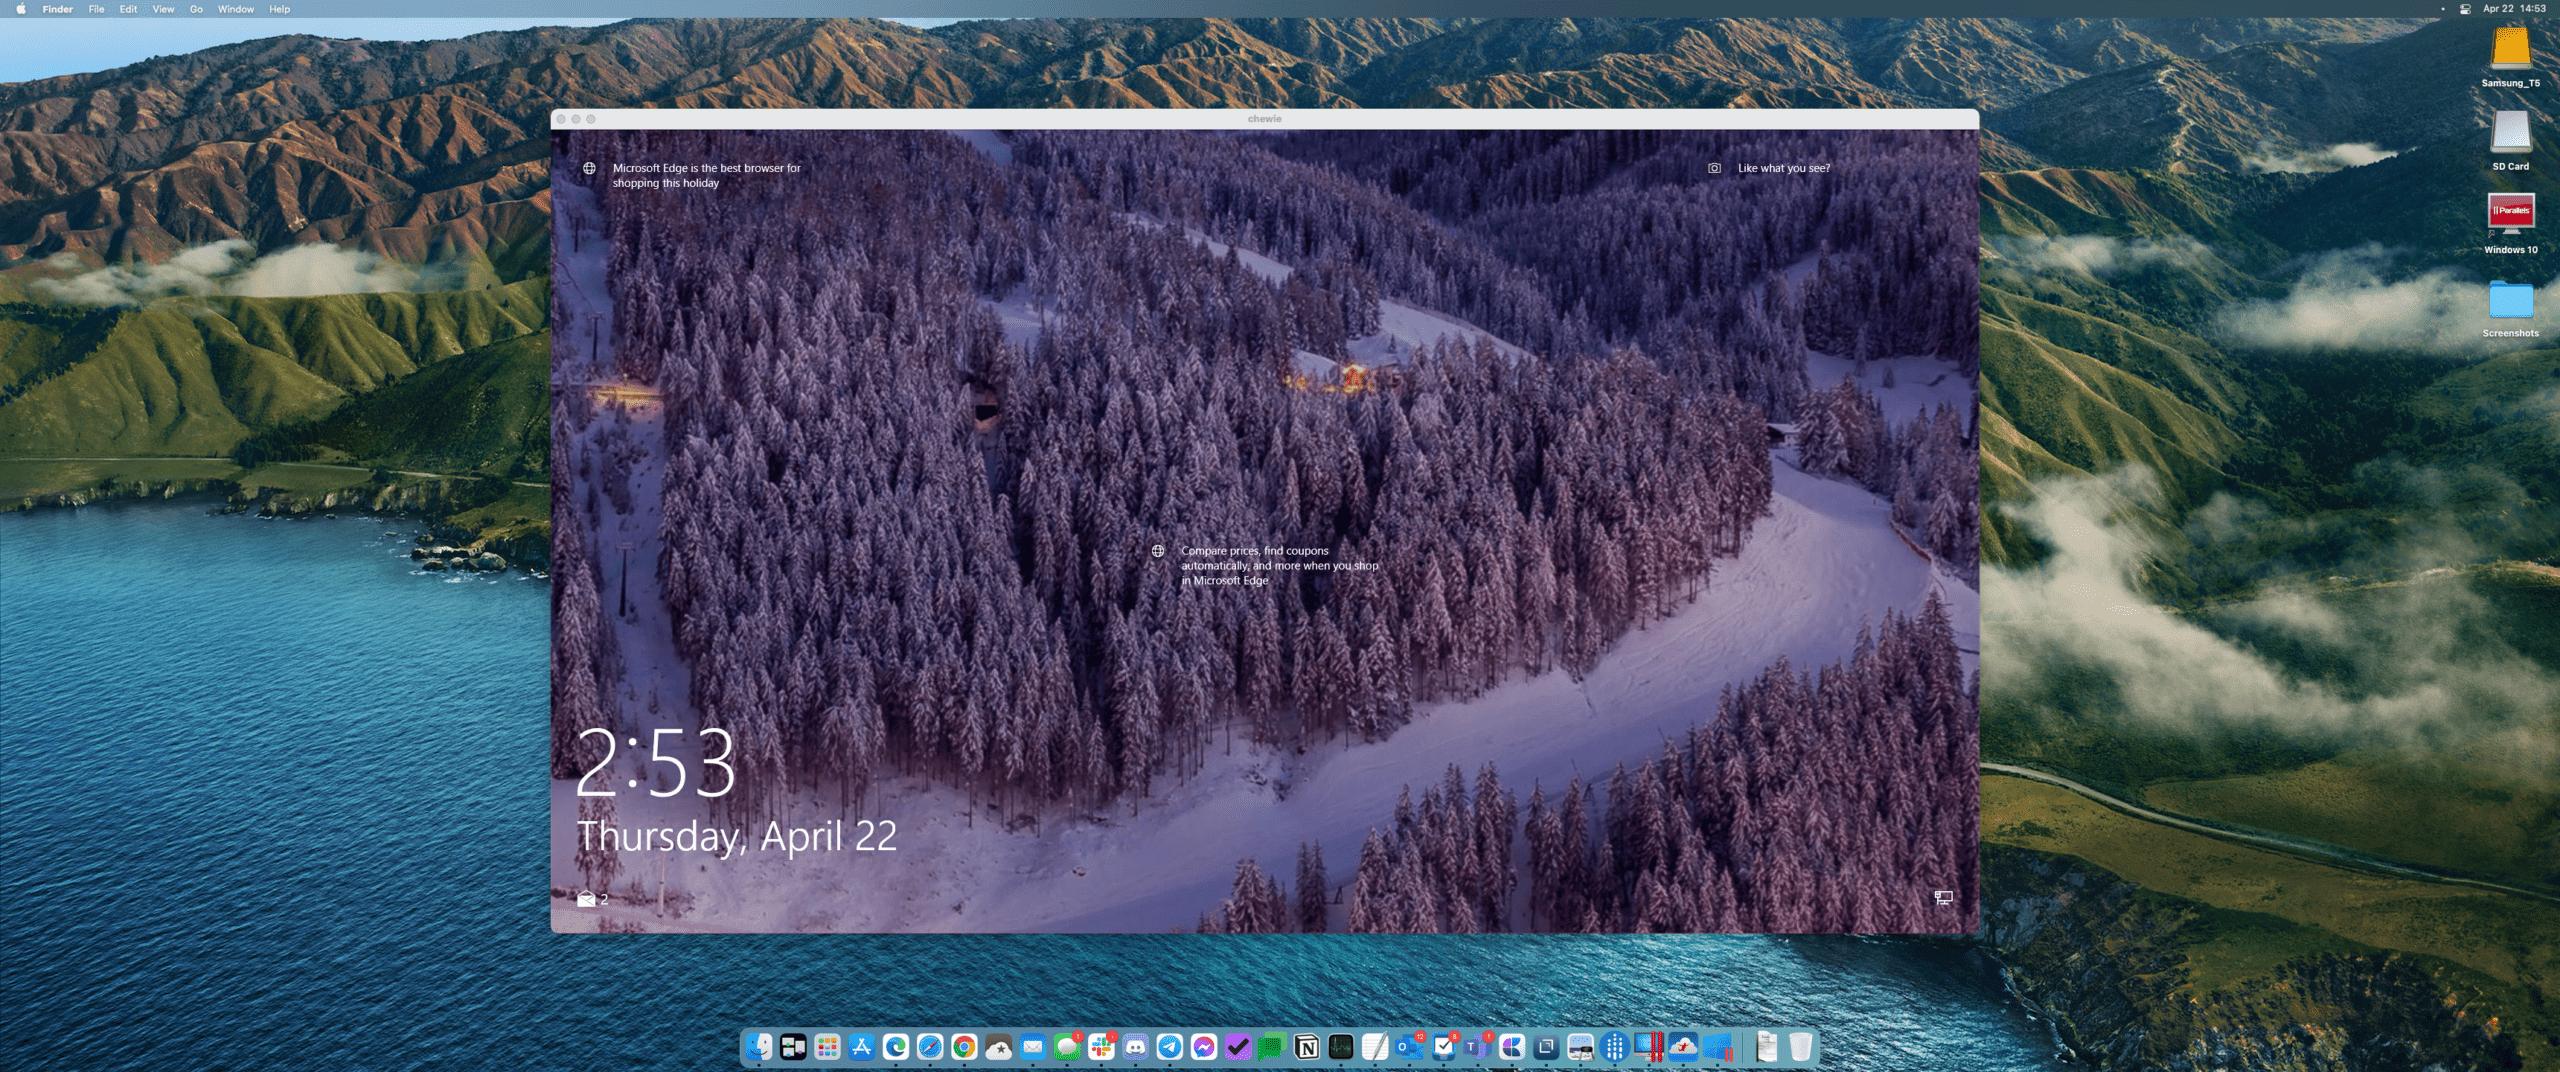 Jump Desktop for Windows on M1 Mac 2